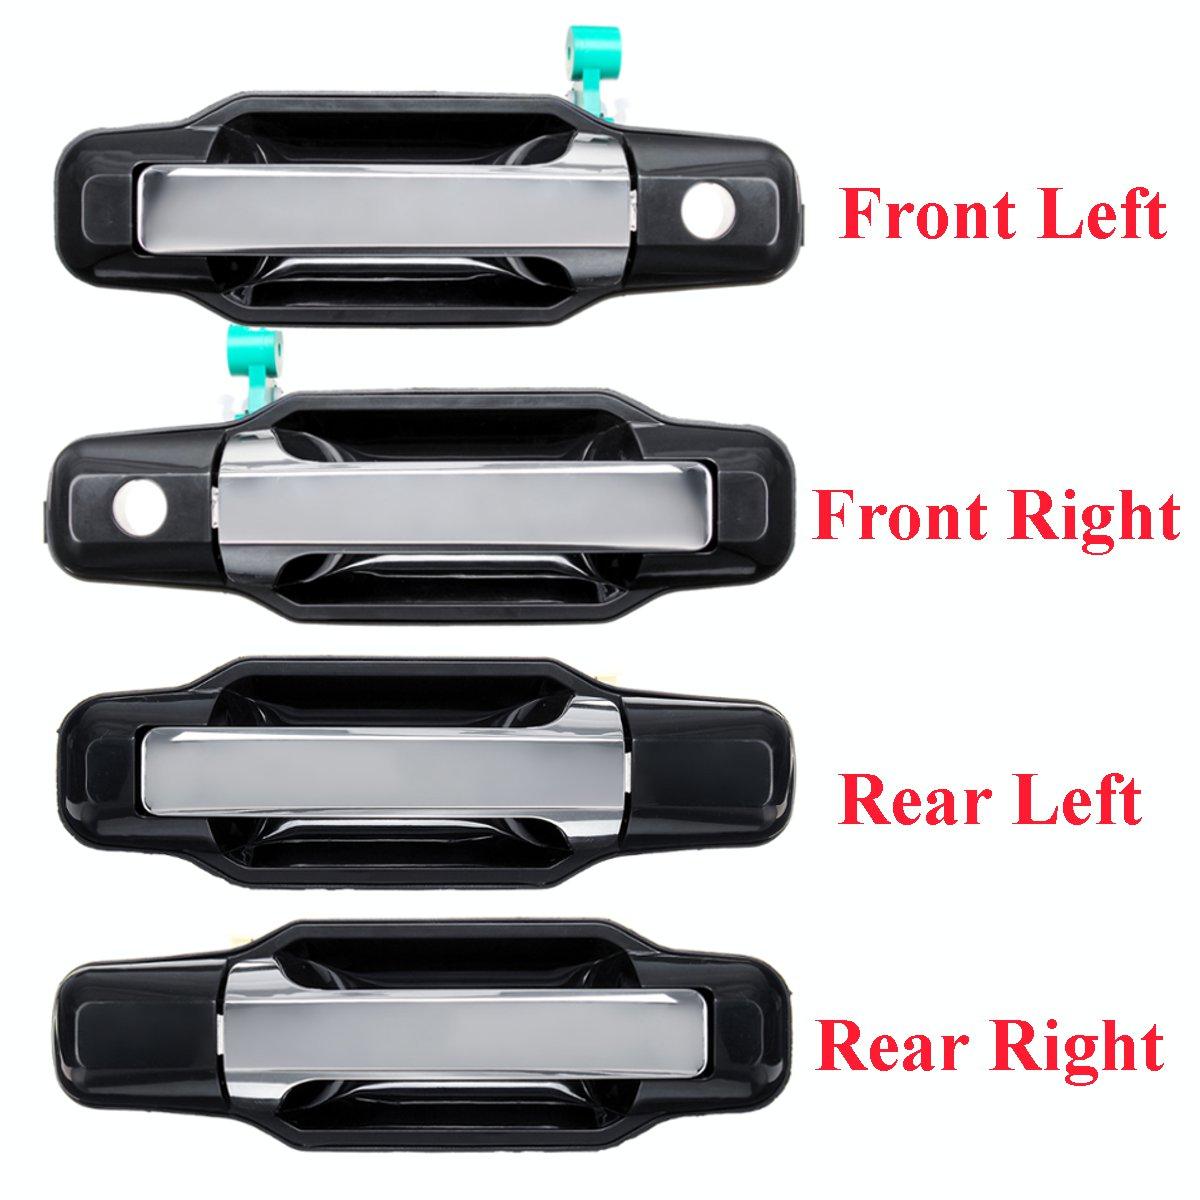 LHD poignée de porte extérieure ABS avant gauche/droite pour Kia Sorento 2003 2004 2005 2006 2007 2008 2009 826503E021 826603E021 836503E01